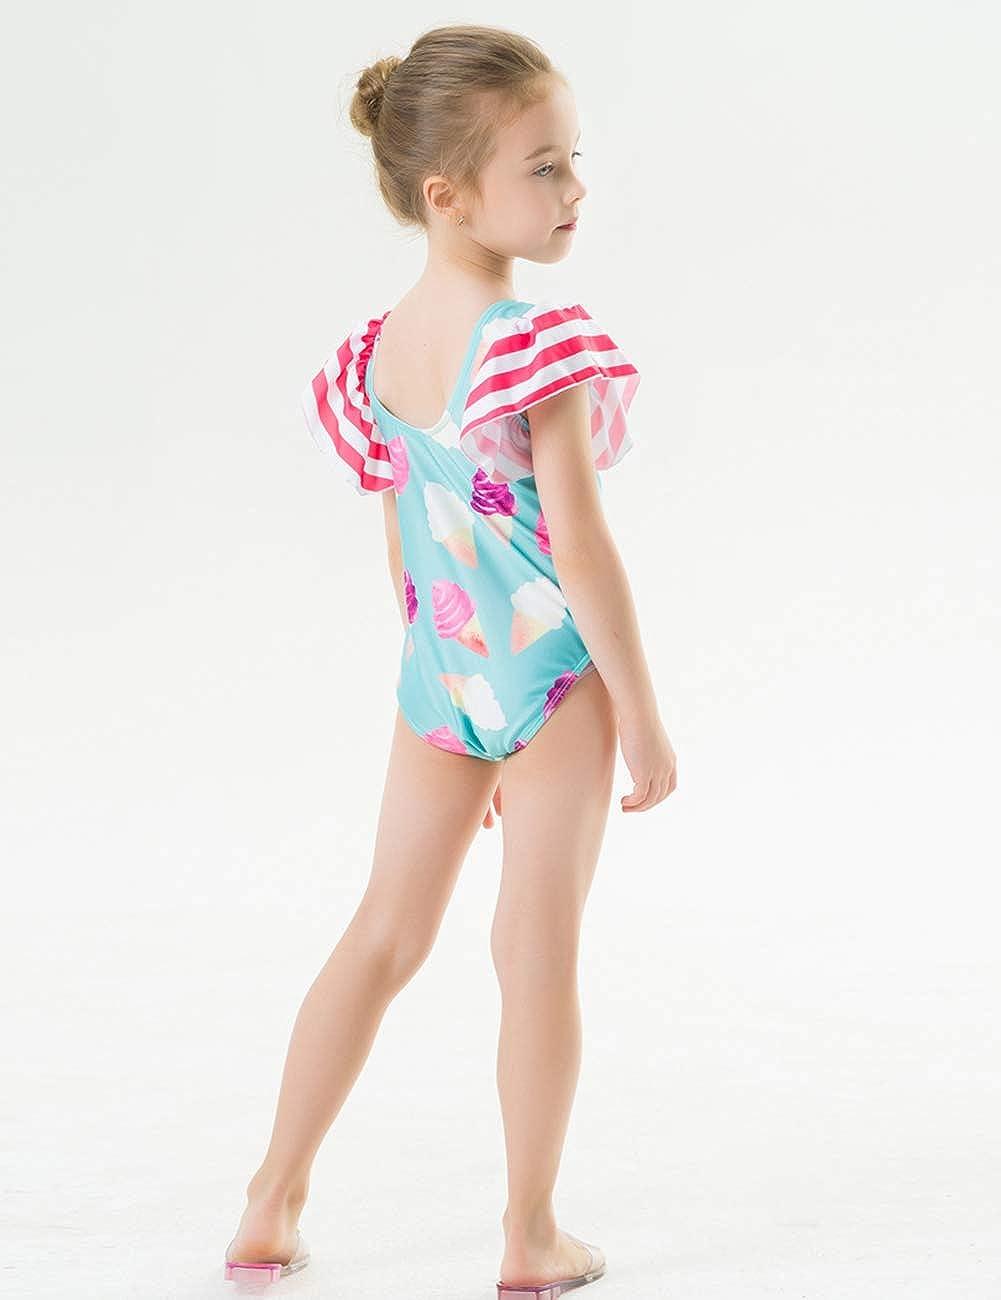 Kids Girls One Piece Swimsuit Colorful Ice Cream Pattern Swimwear Green 2-3T